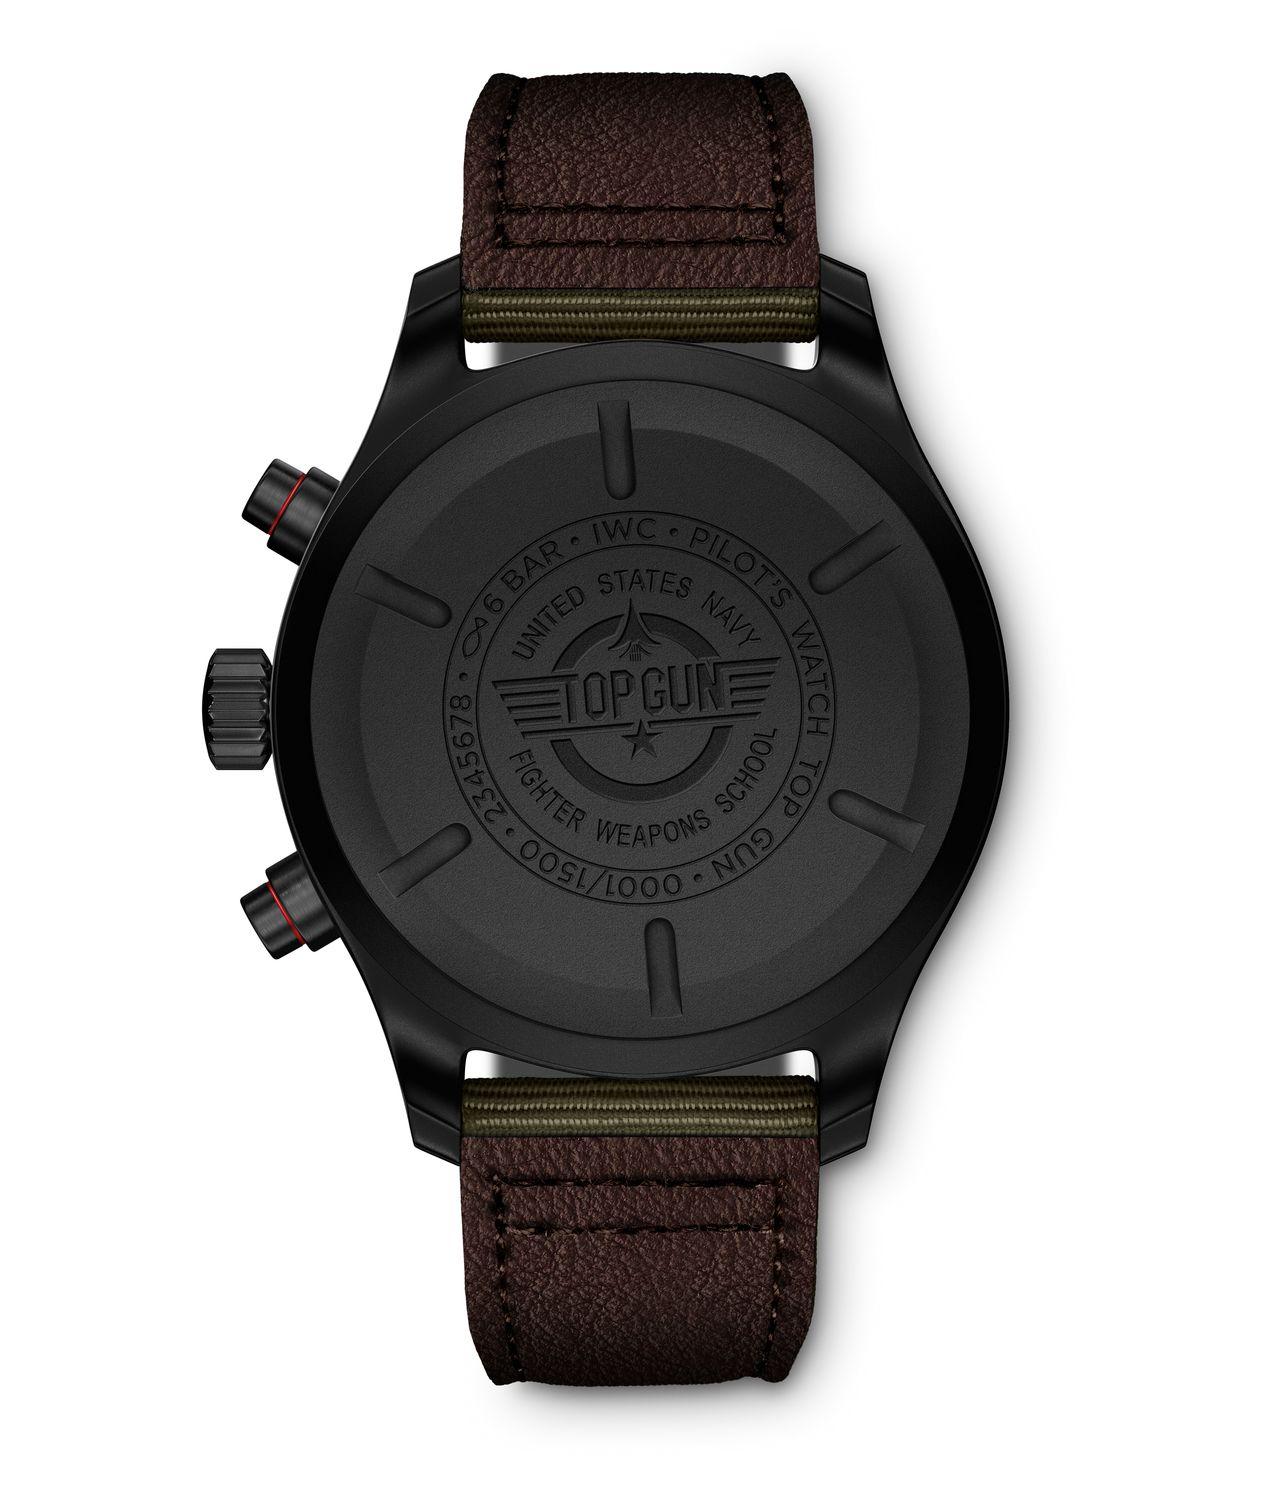 "IWC Pilot's Watch Chronograph Top Gun Edition ""SFTI"" - Hátlap Cerataniumból"